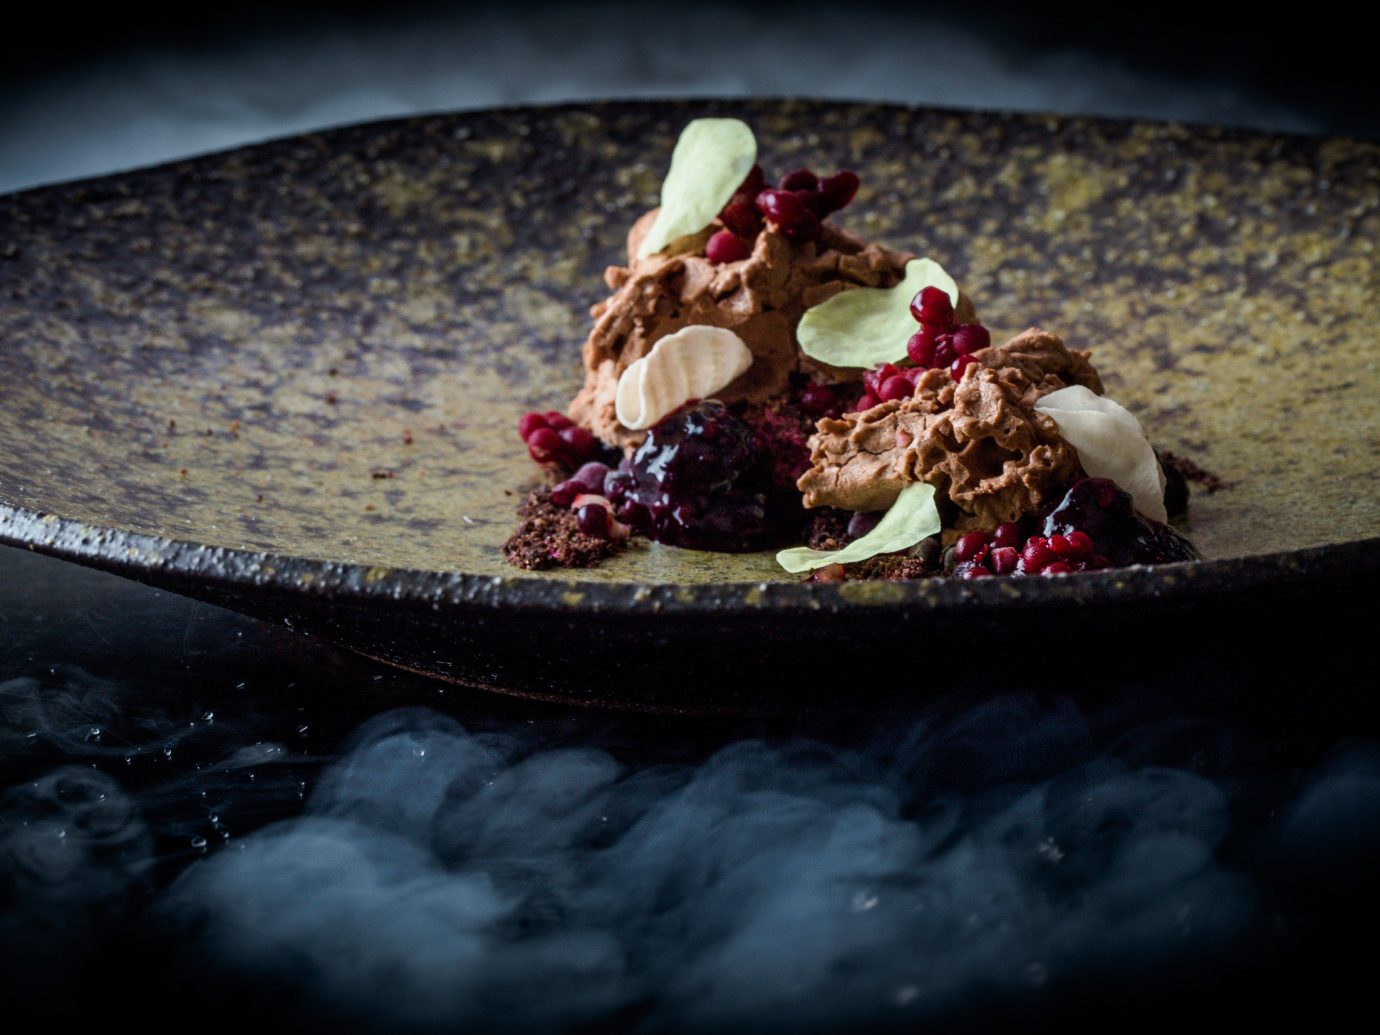 Food + Drink indoor food photography macro photography produce flower dark dessert